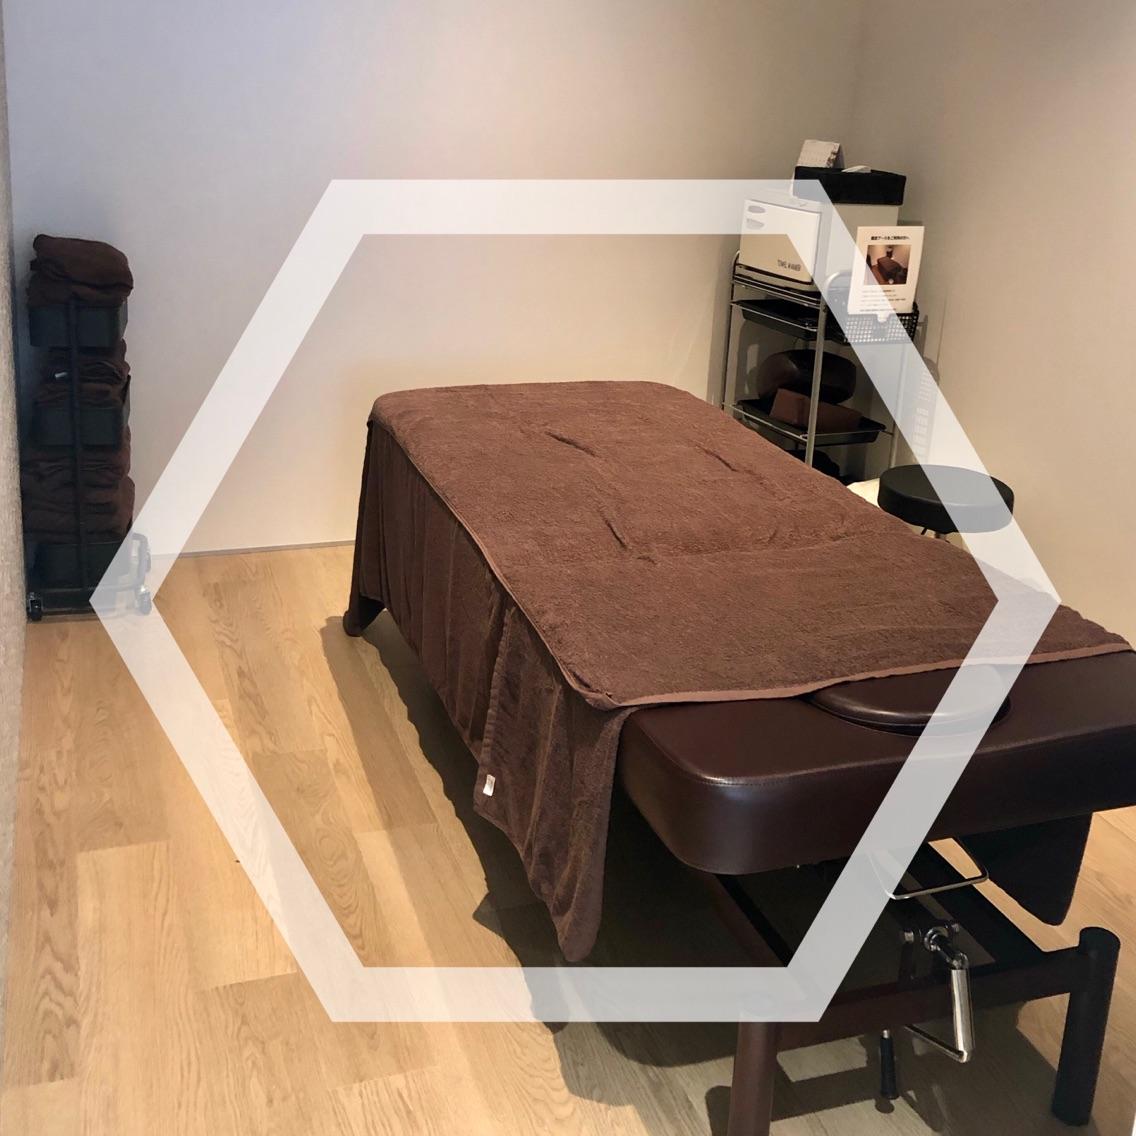 Soins〜Aging Care Salon